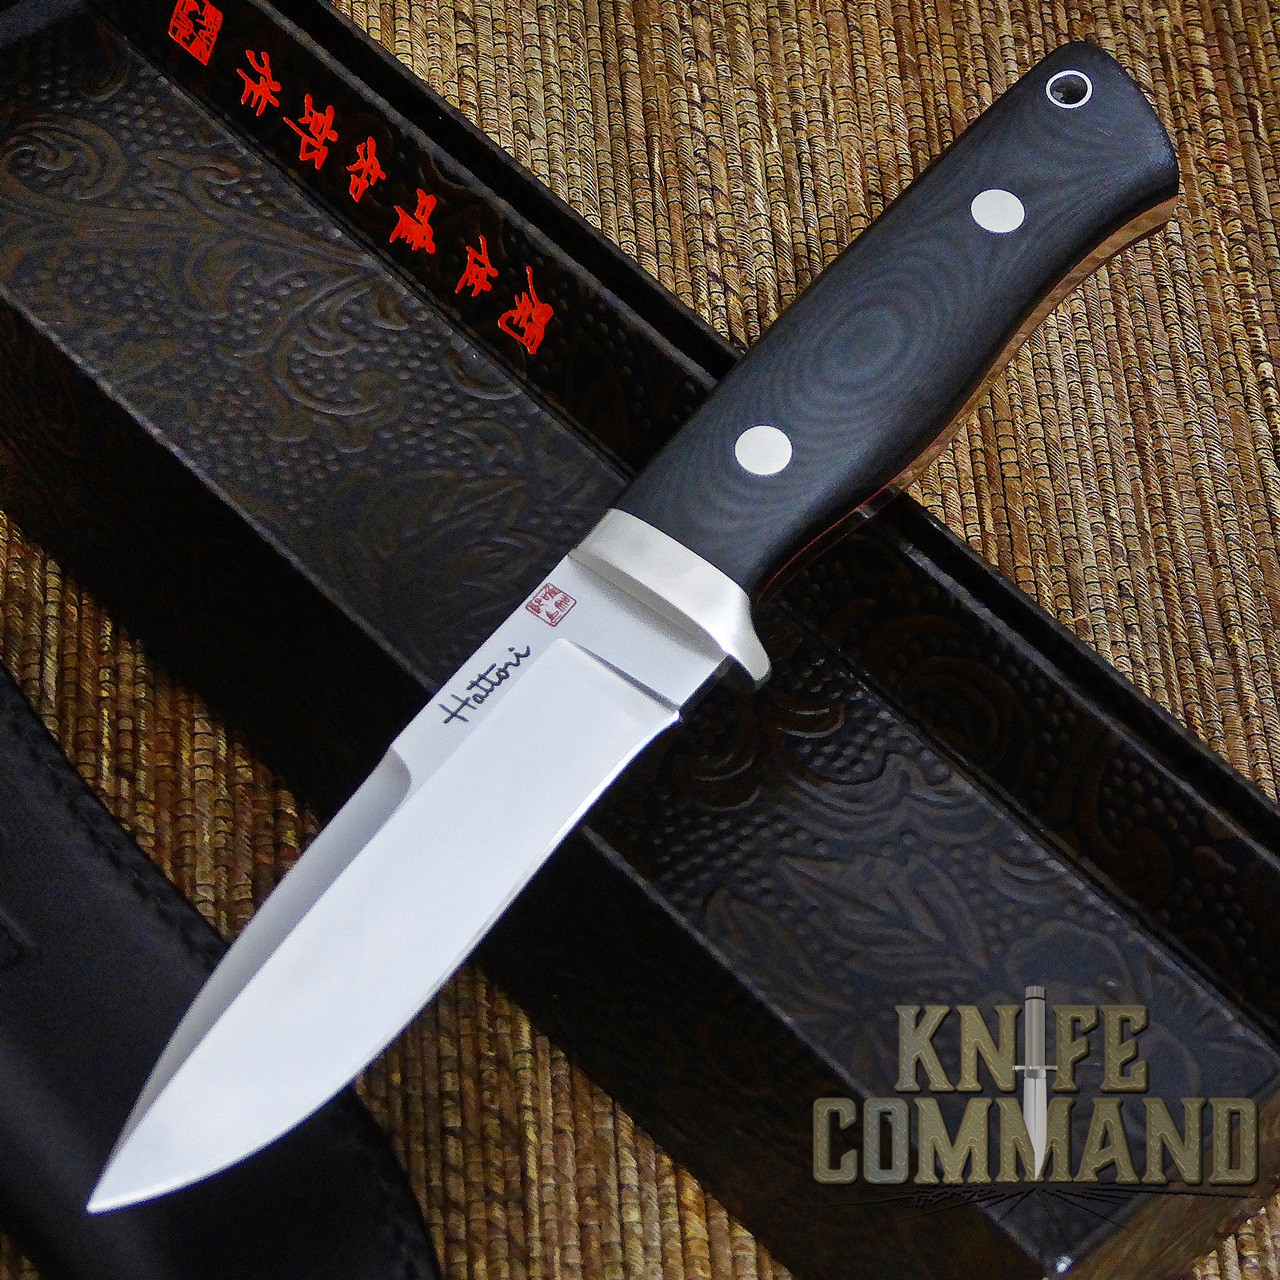 Hattori Knives Dream Hunter Ht-05 Red Hunting Knife